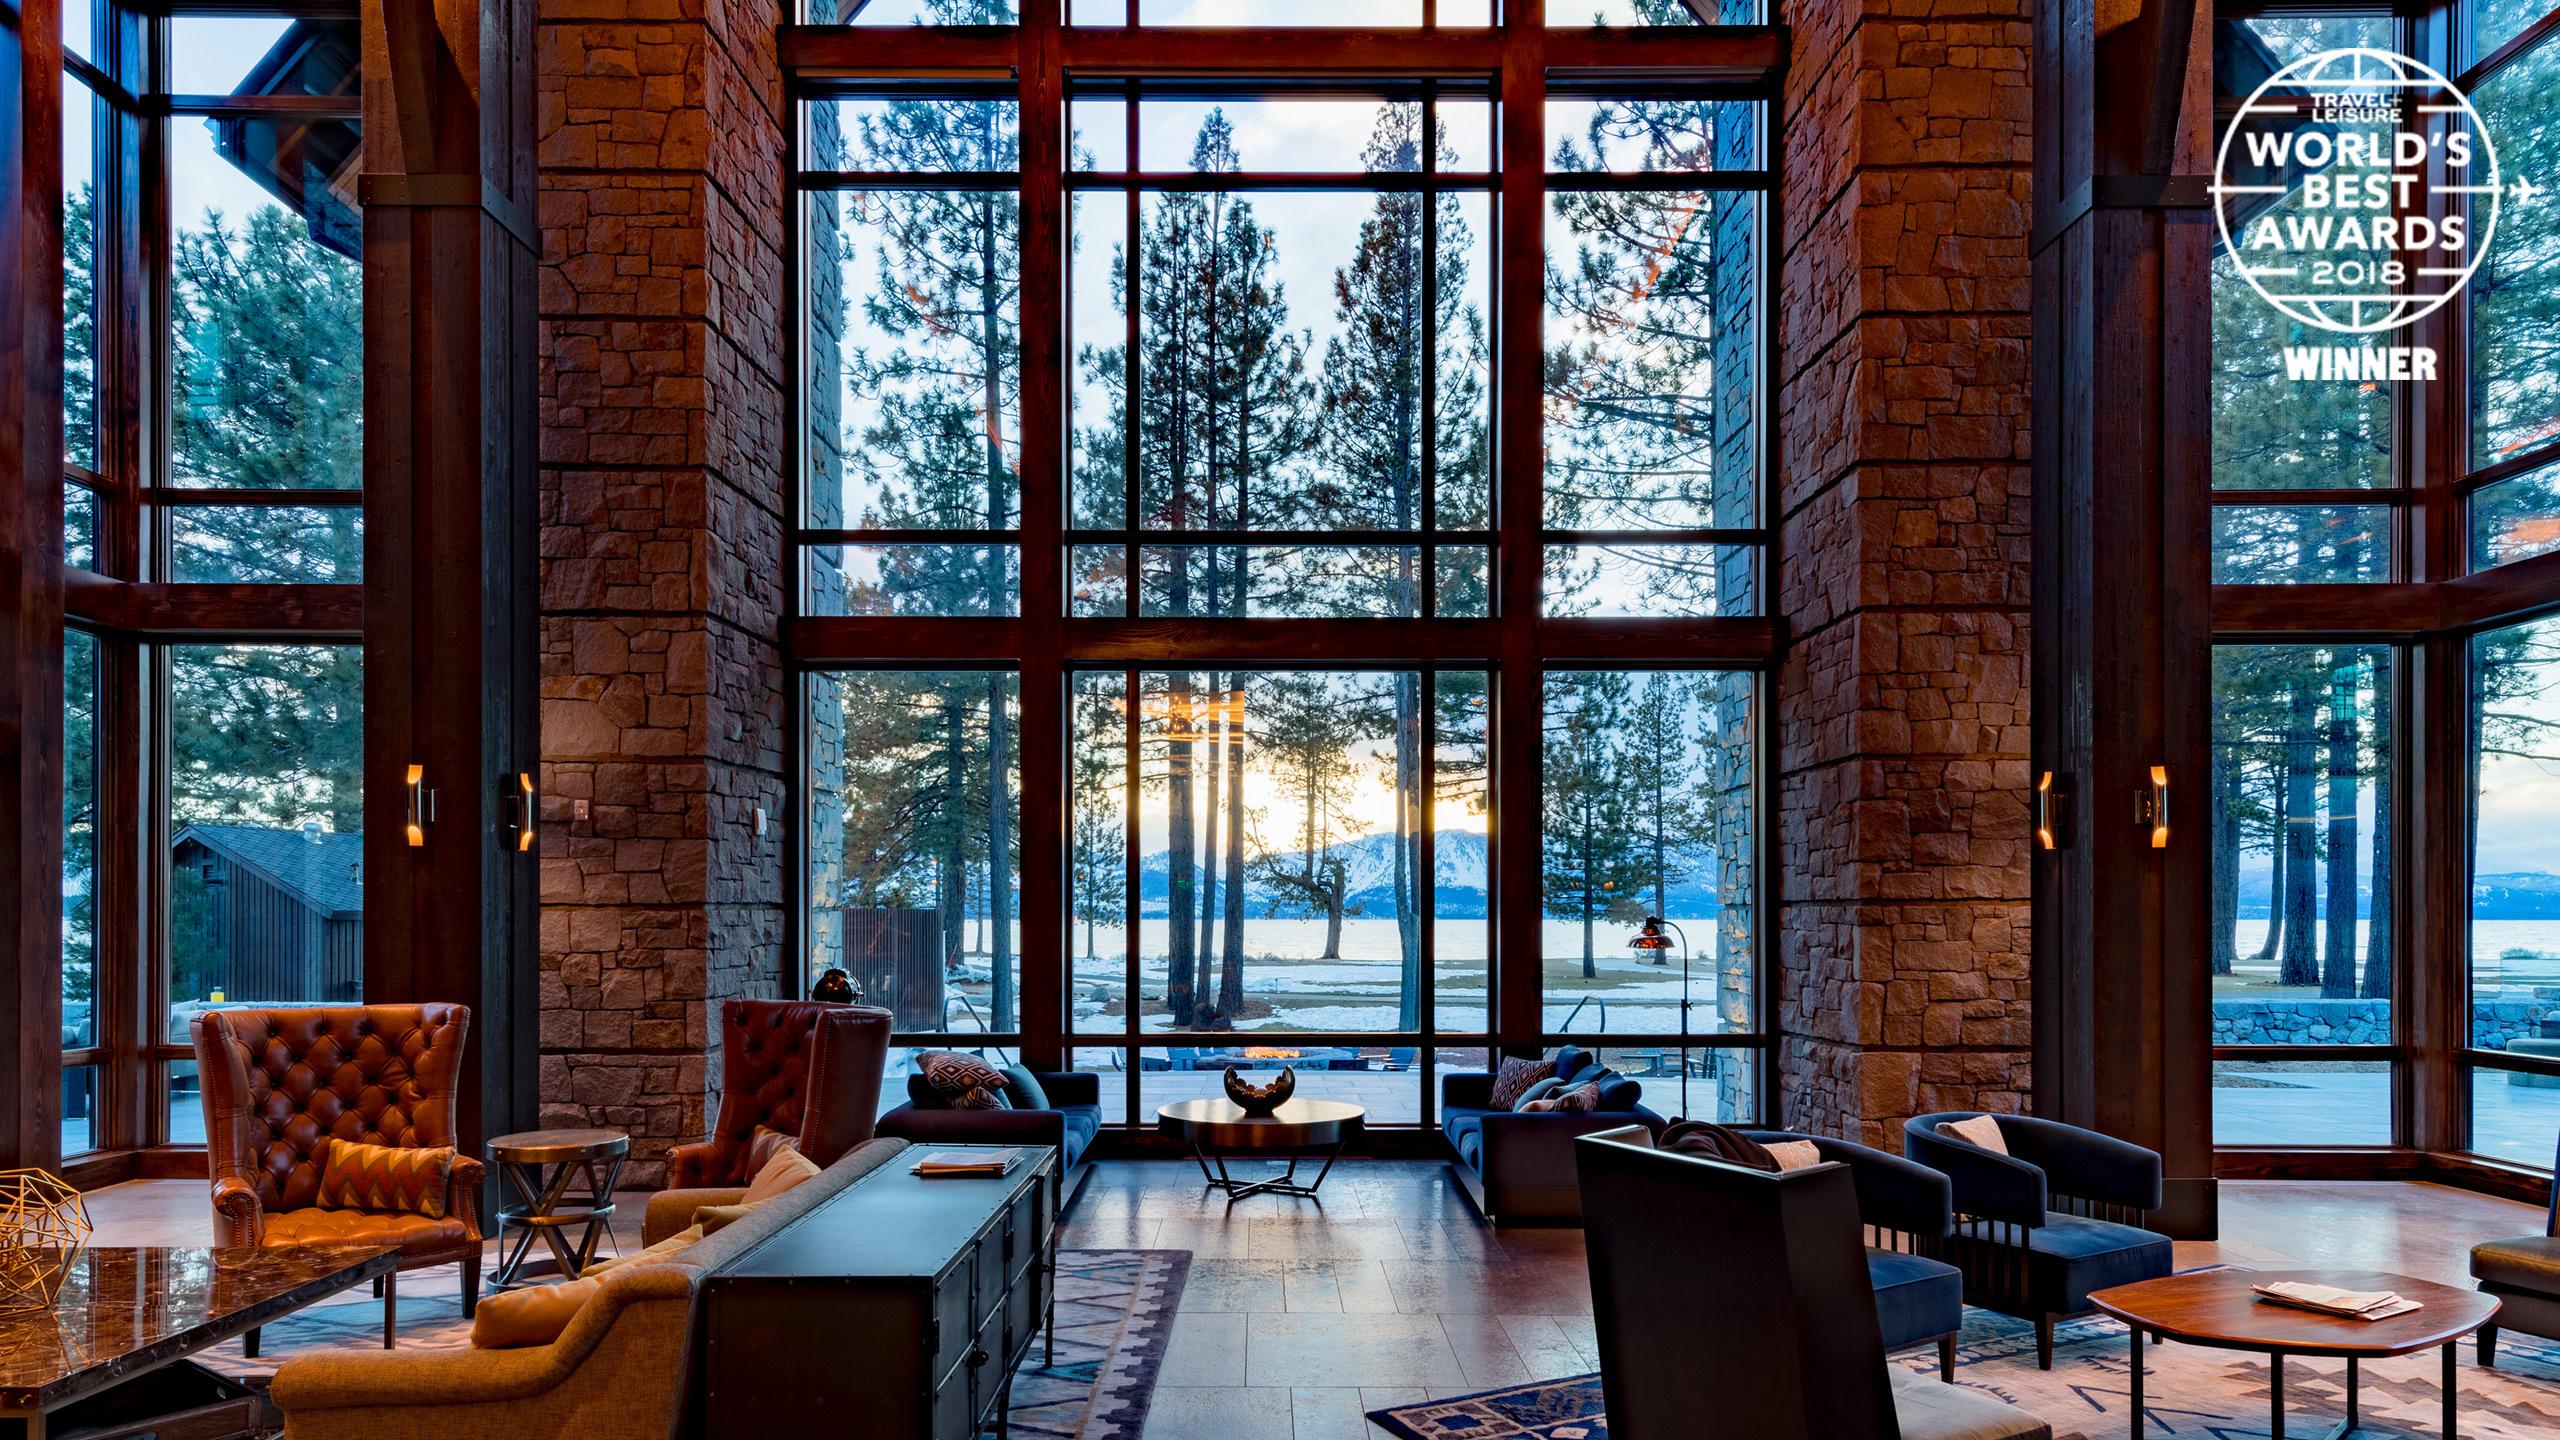 Top US Resort Hotel_Edgewood